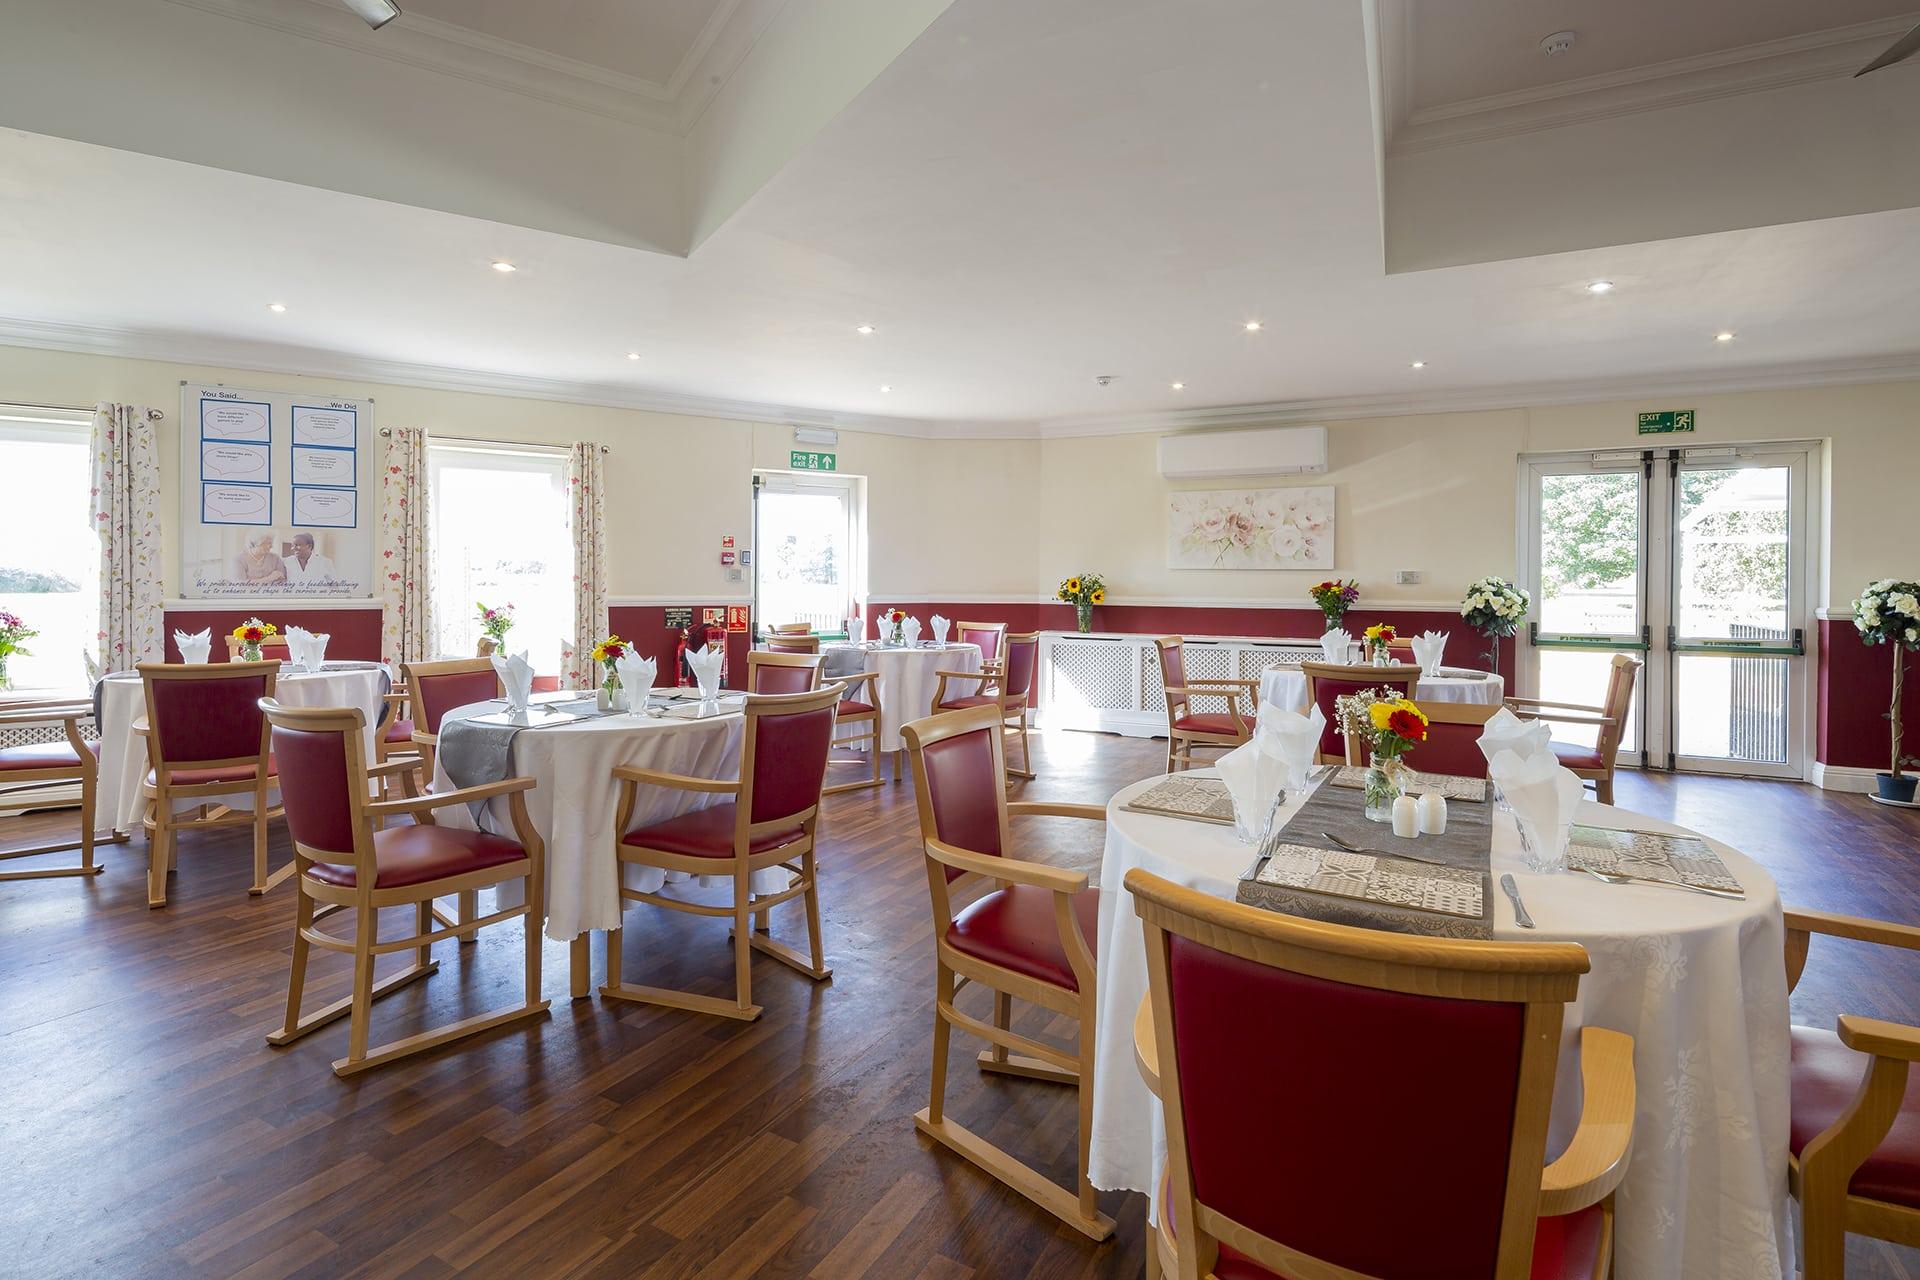 Stambridge Meadows Care Home dining room